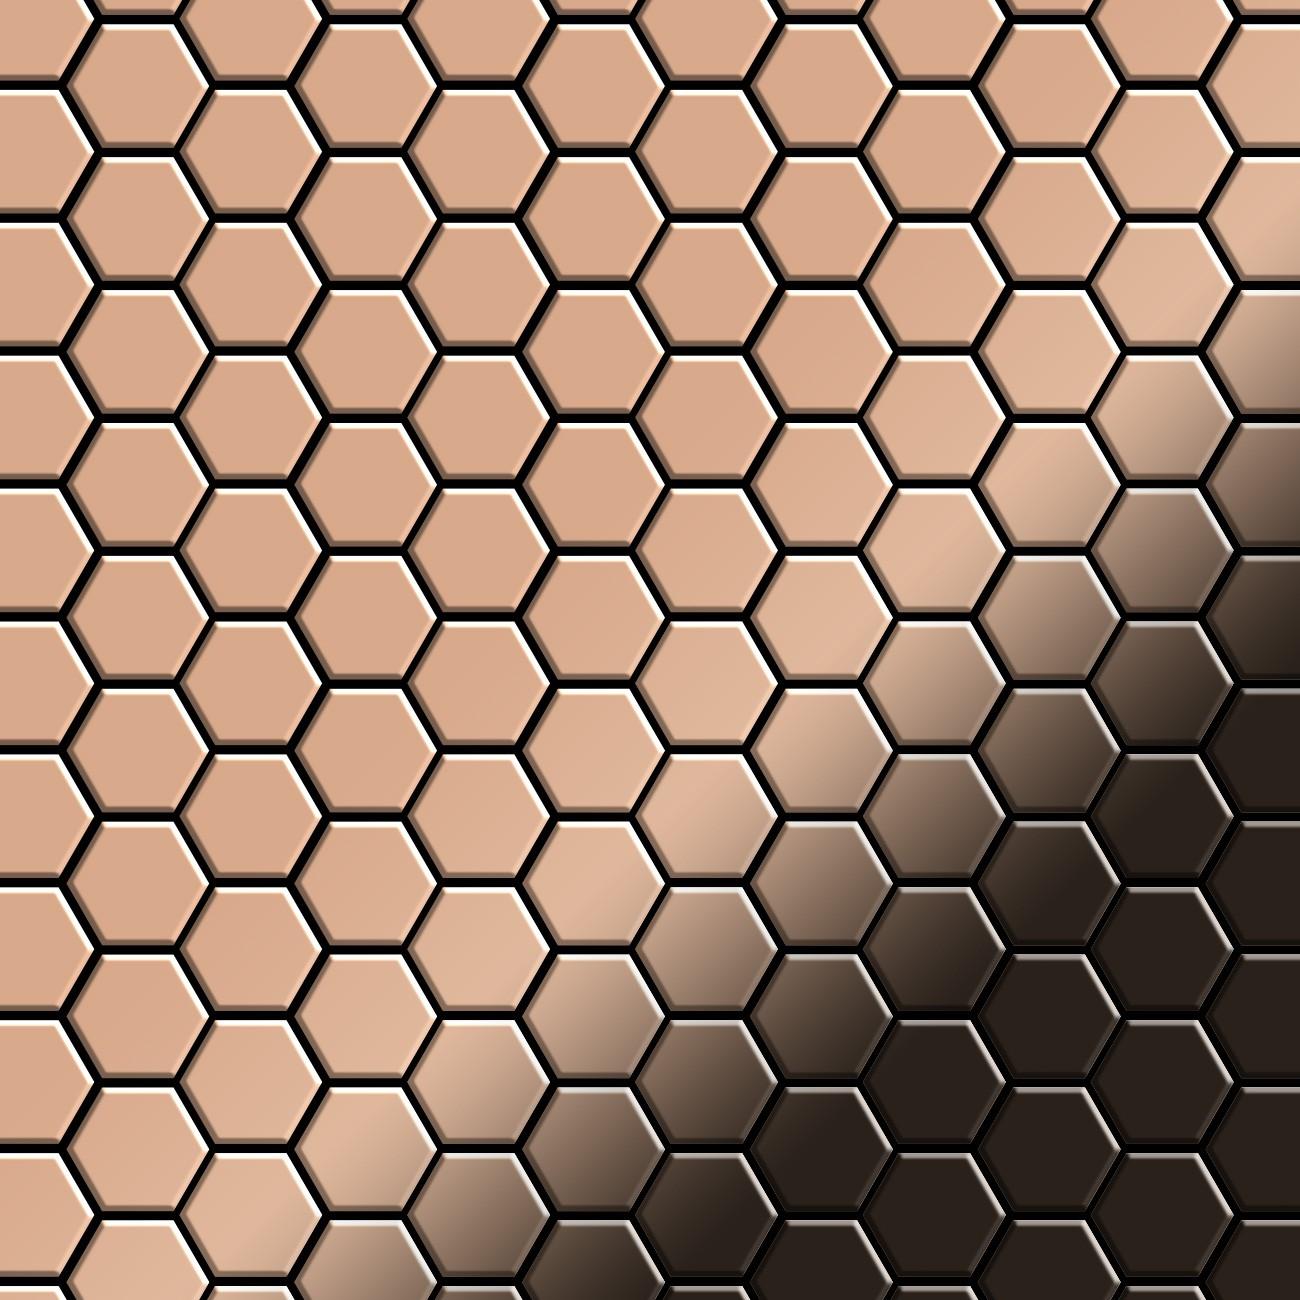 mosaik fliese massiv metall kupfer gewalzt kupfer 1 6mm stark honey cm ebay. Black Bedroom Furniture Sets. Home Design Ideas